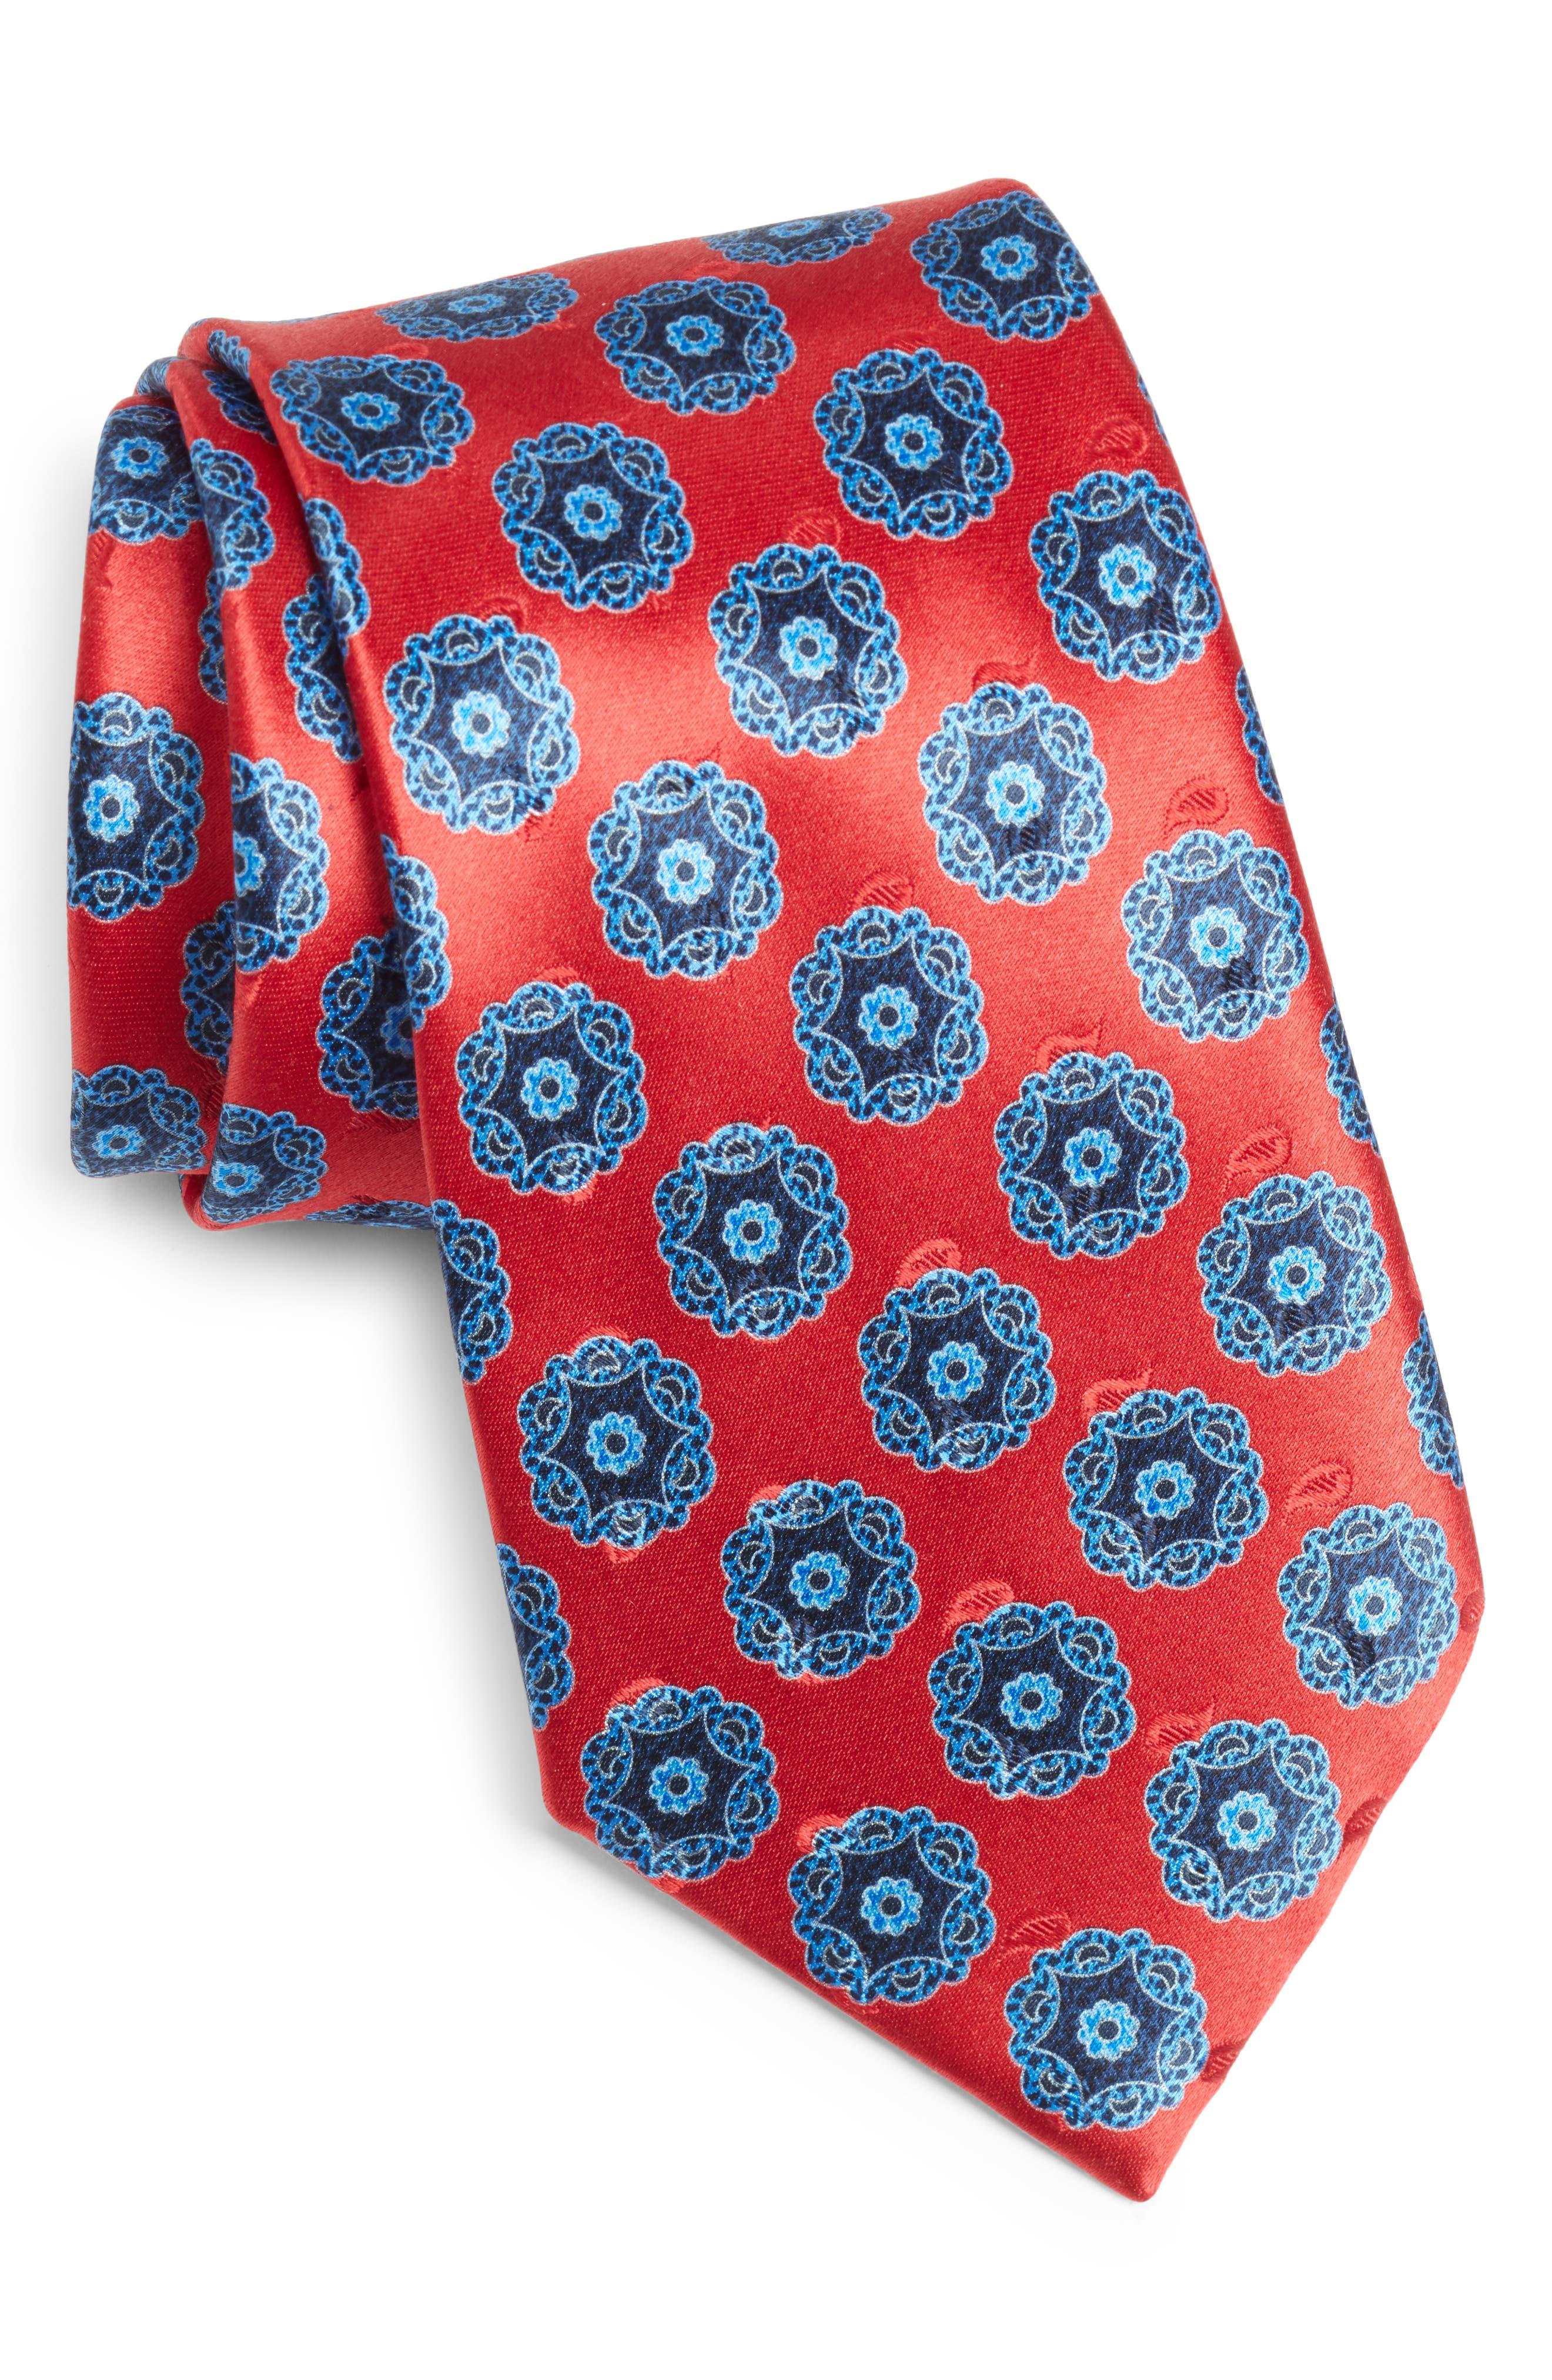 Men/'s Fashion White Multicolor Flowered Neck Tie Gift Box